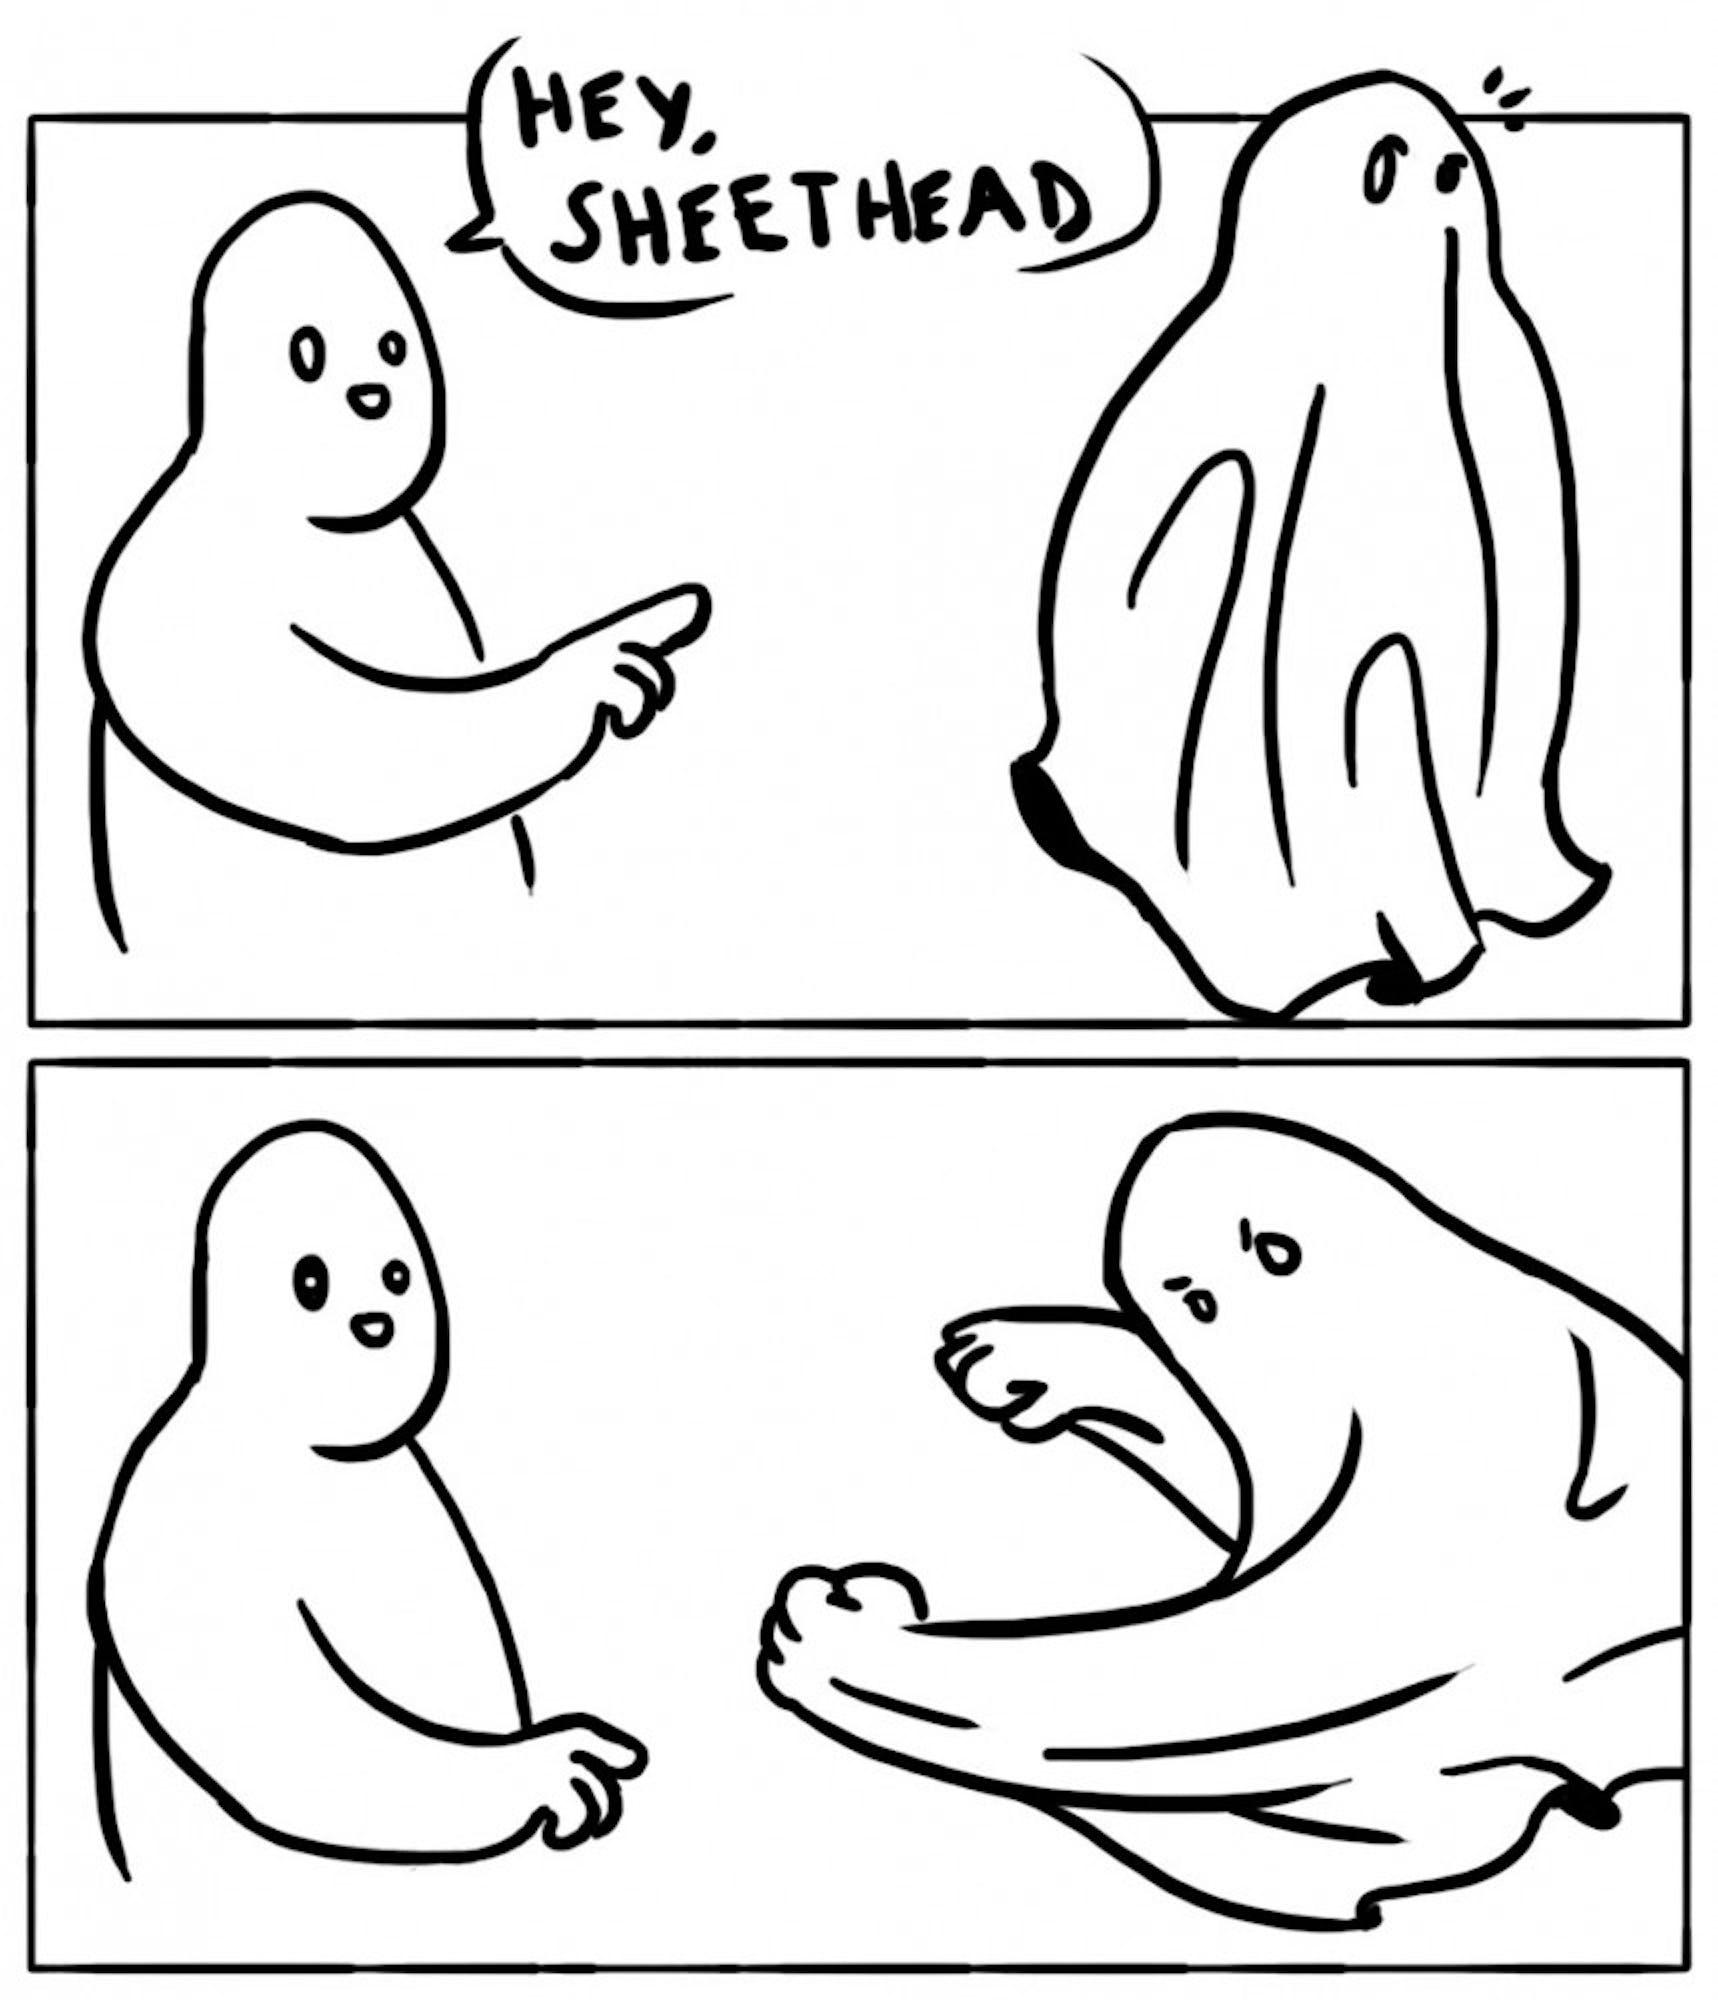 lincoln_sheethead